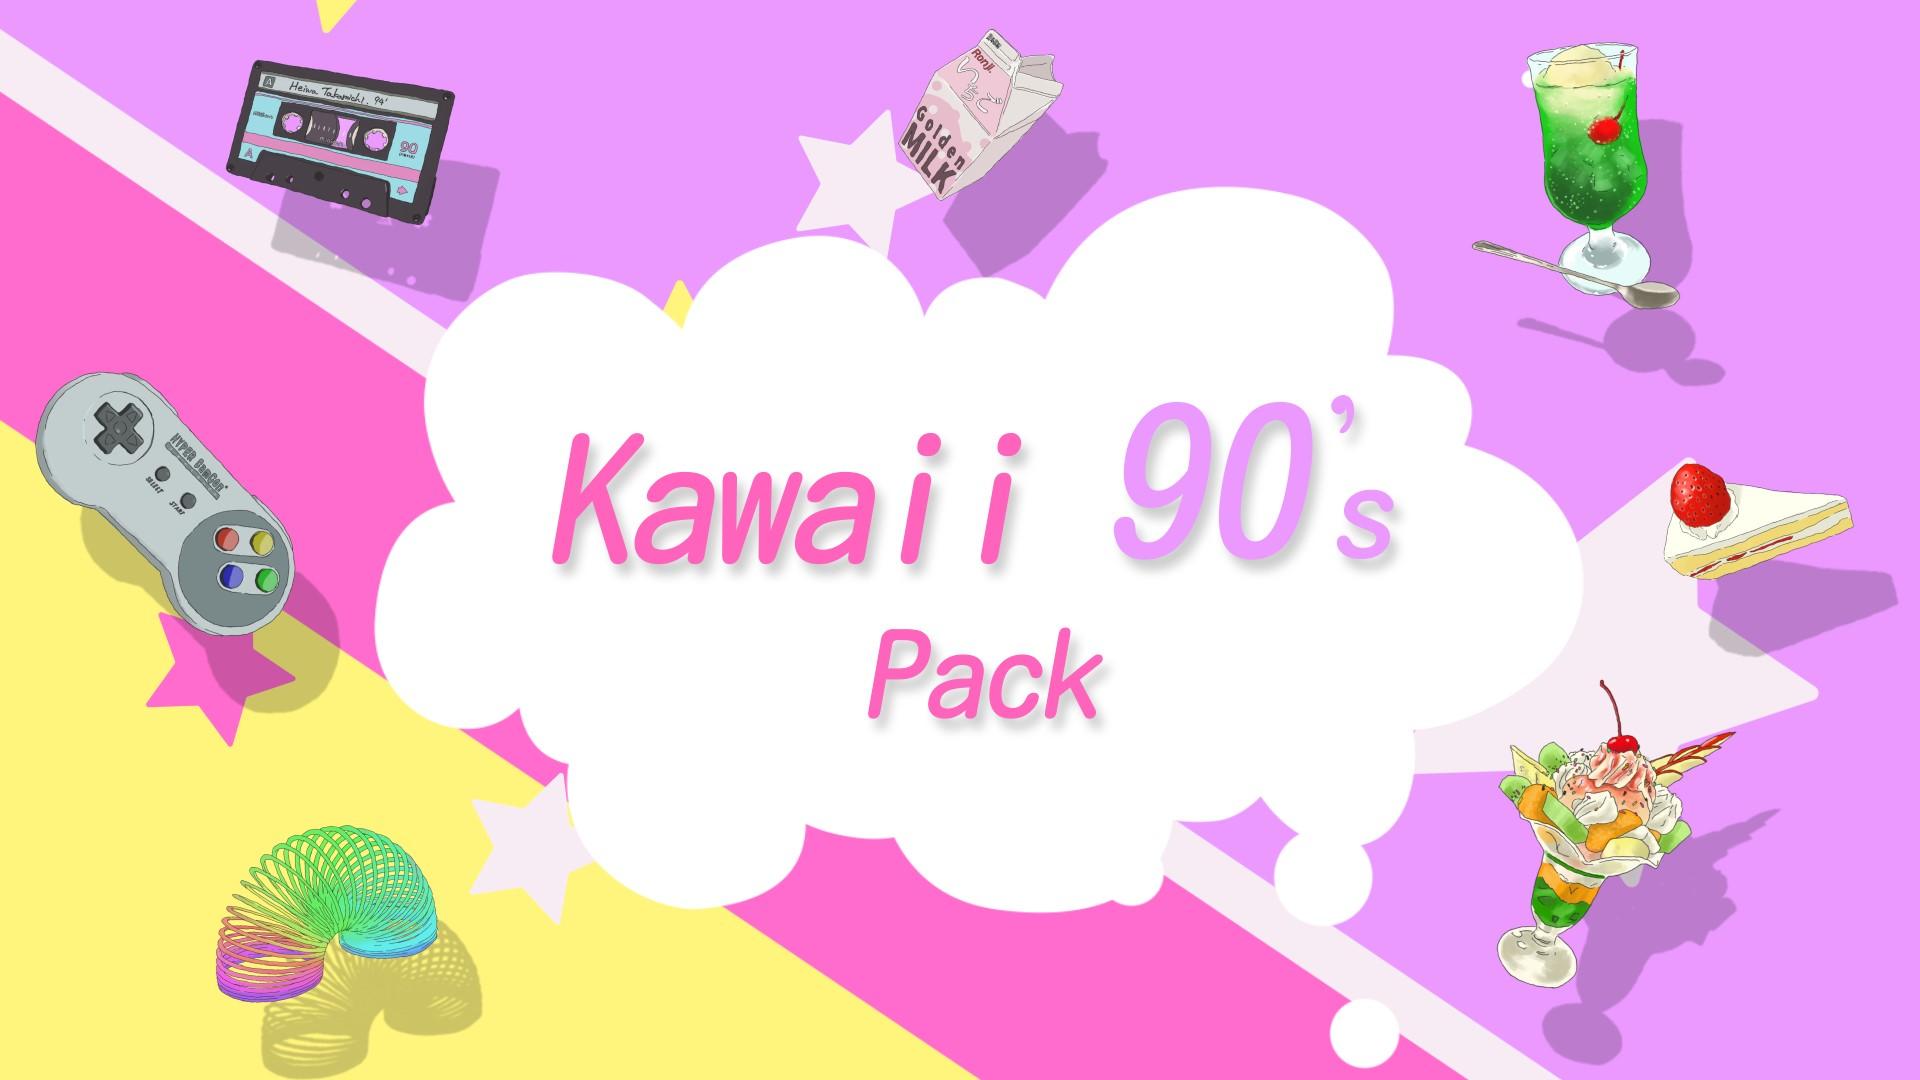 Kawaii 90s Pack